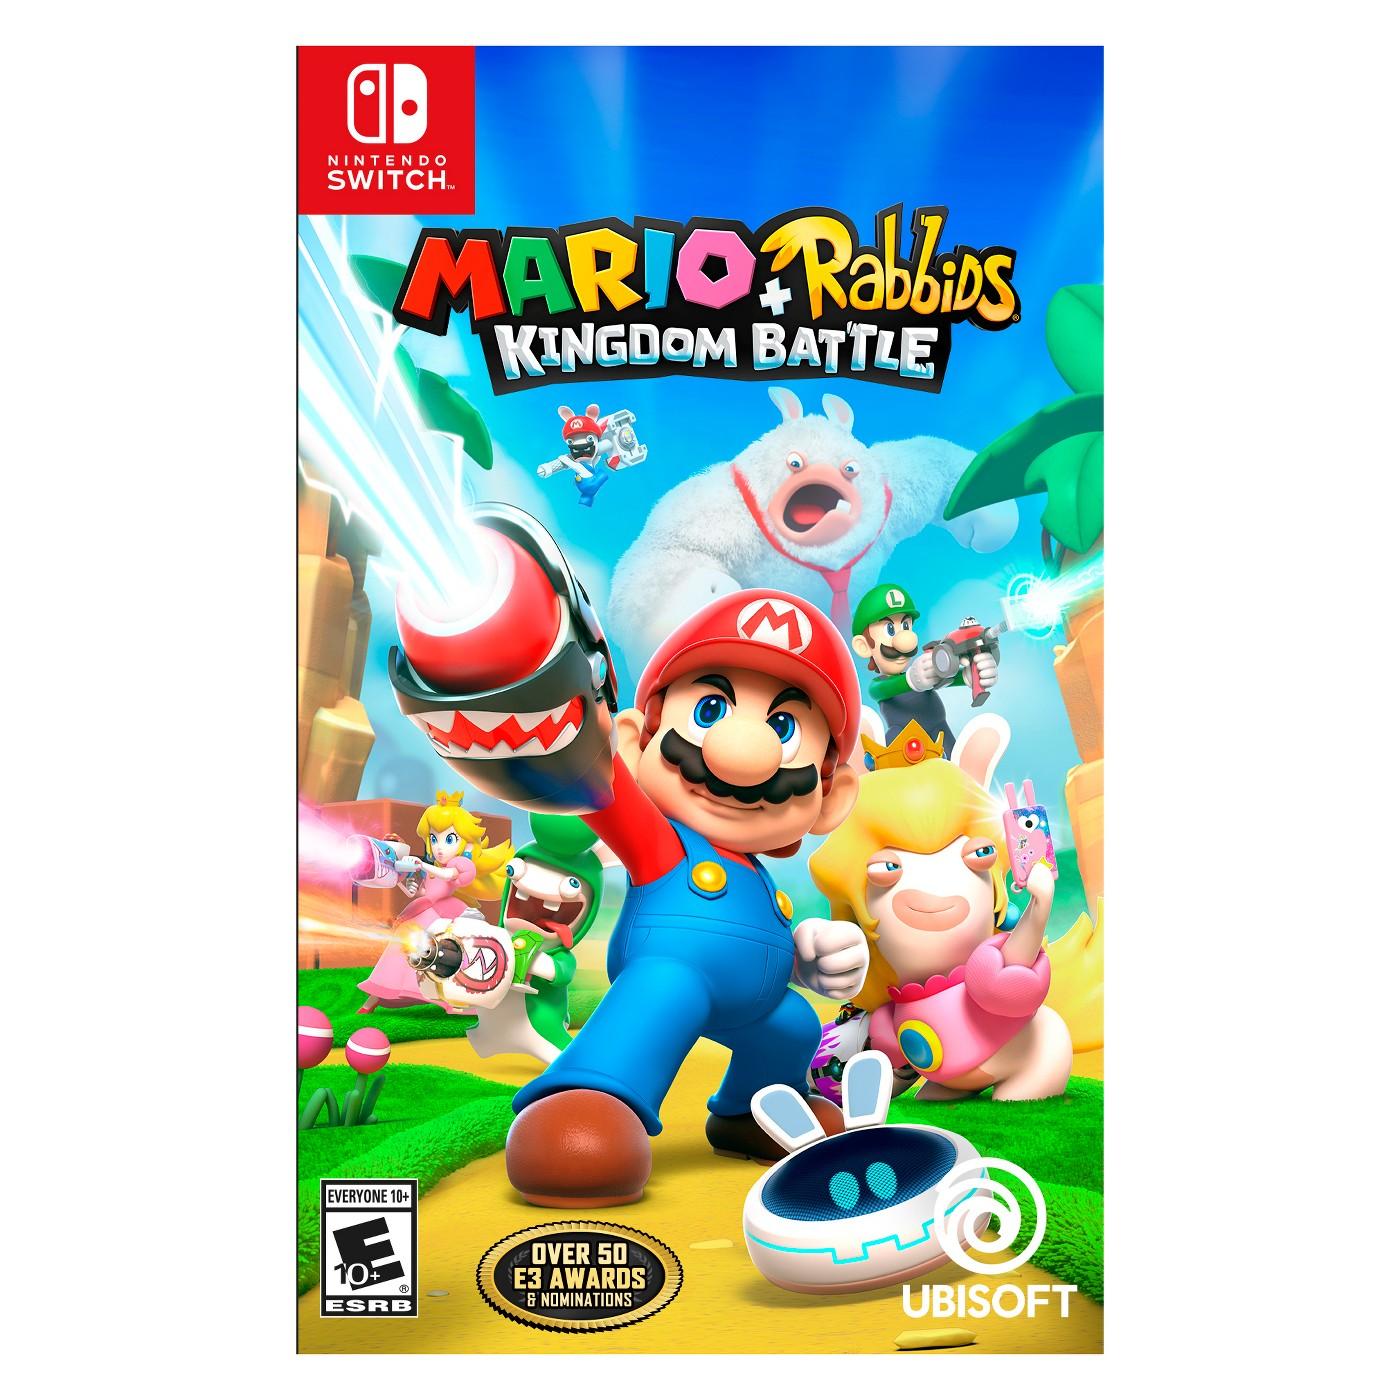 Mario + Rabbids Kingdom Battle - Nintendo Switch - image 1 of 6